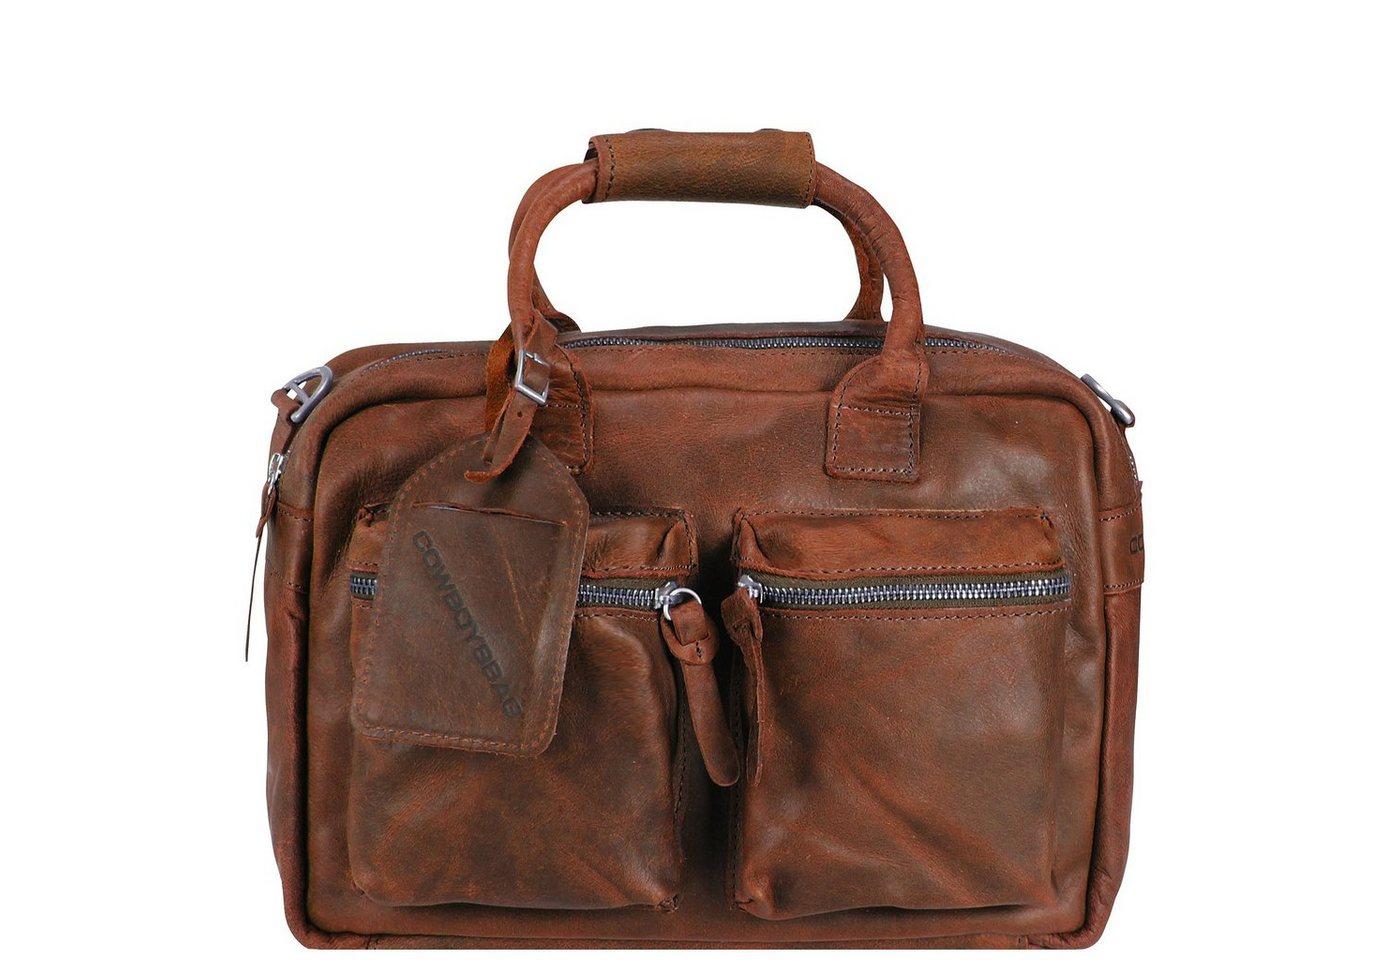 Damen Cowboysbag Little Bag Henkeltasche Leder 31 cm braun | 08718586224148